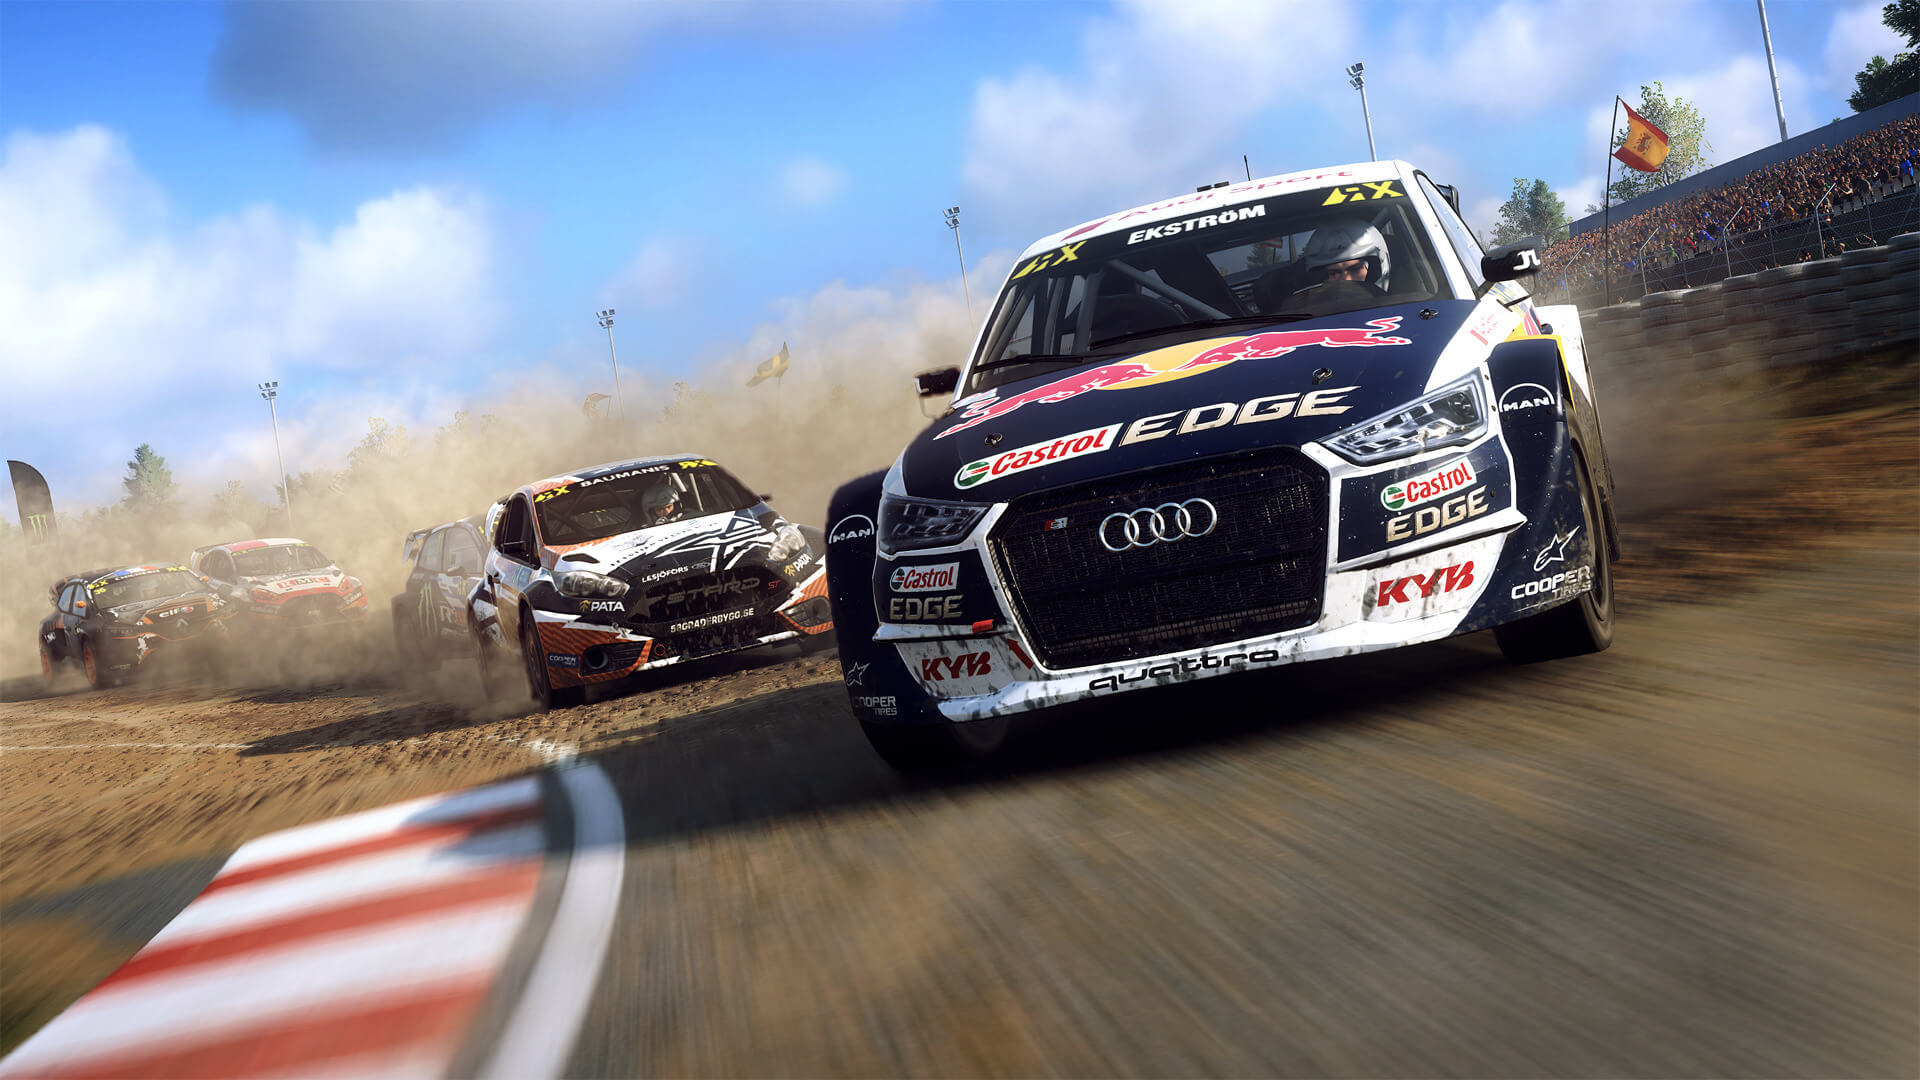 DiRT Rally 2.0 PC Performance Analysis